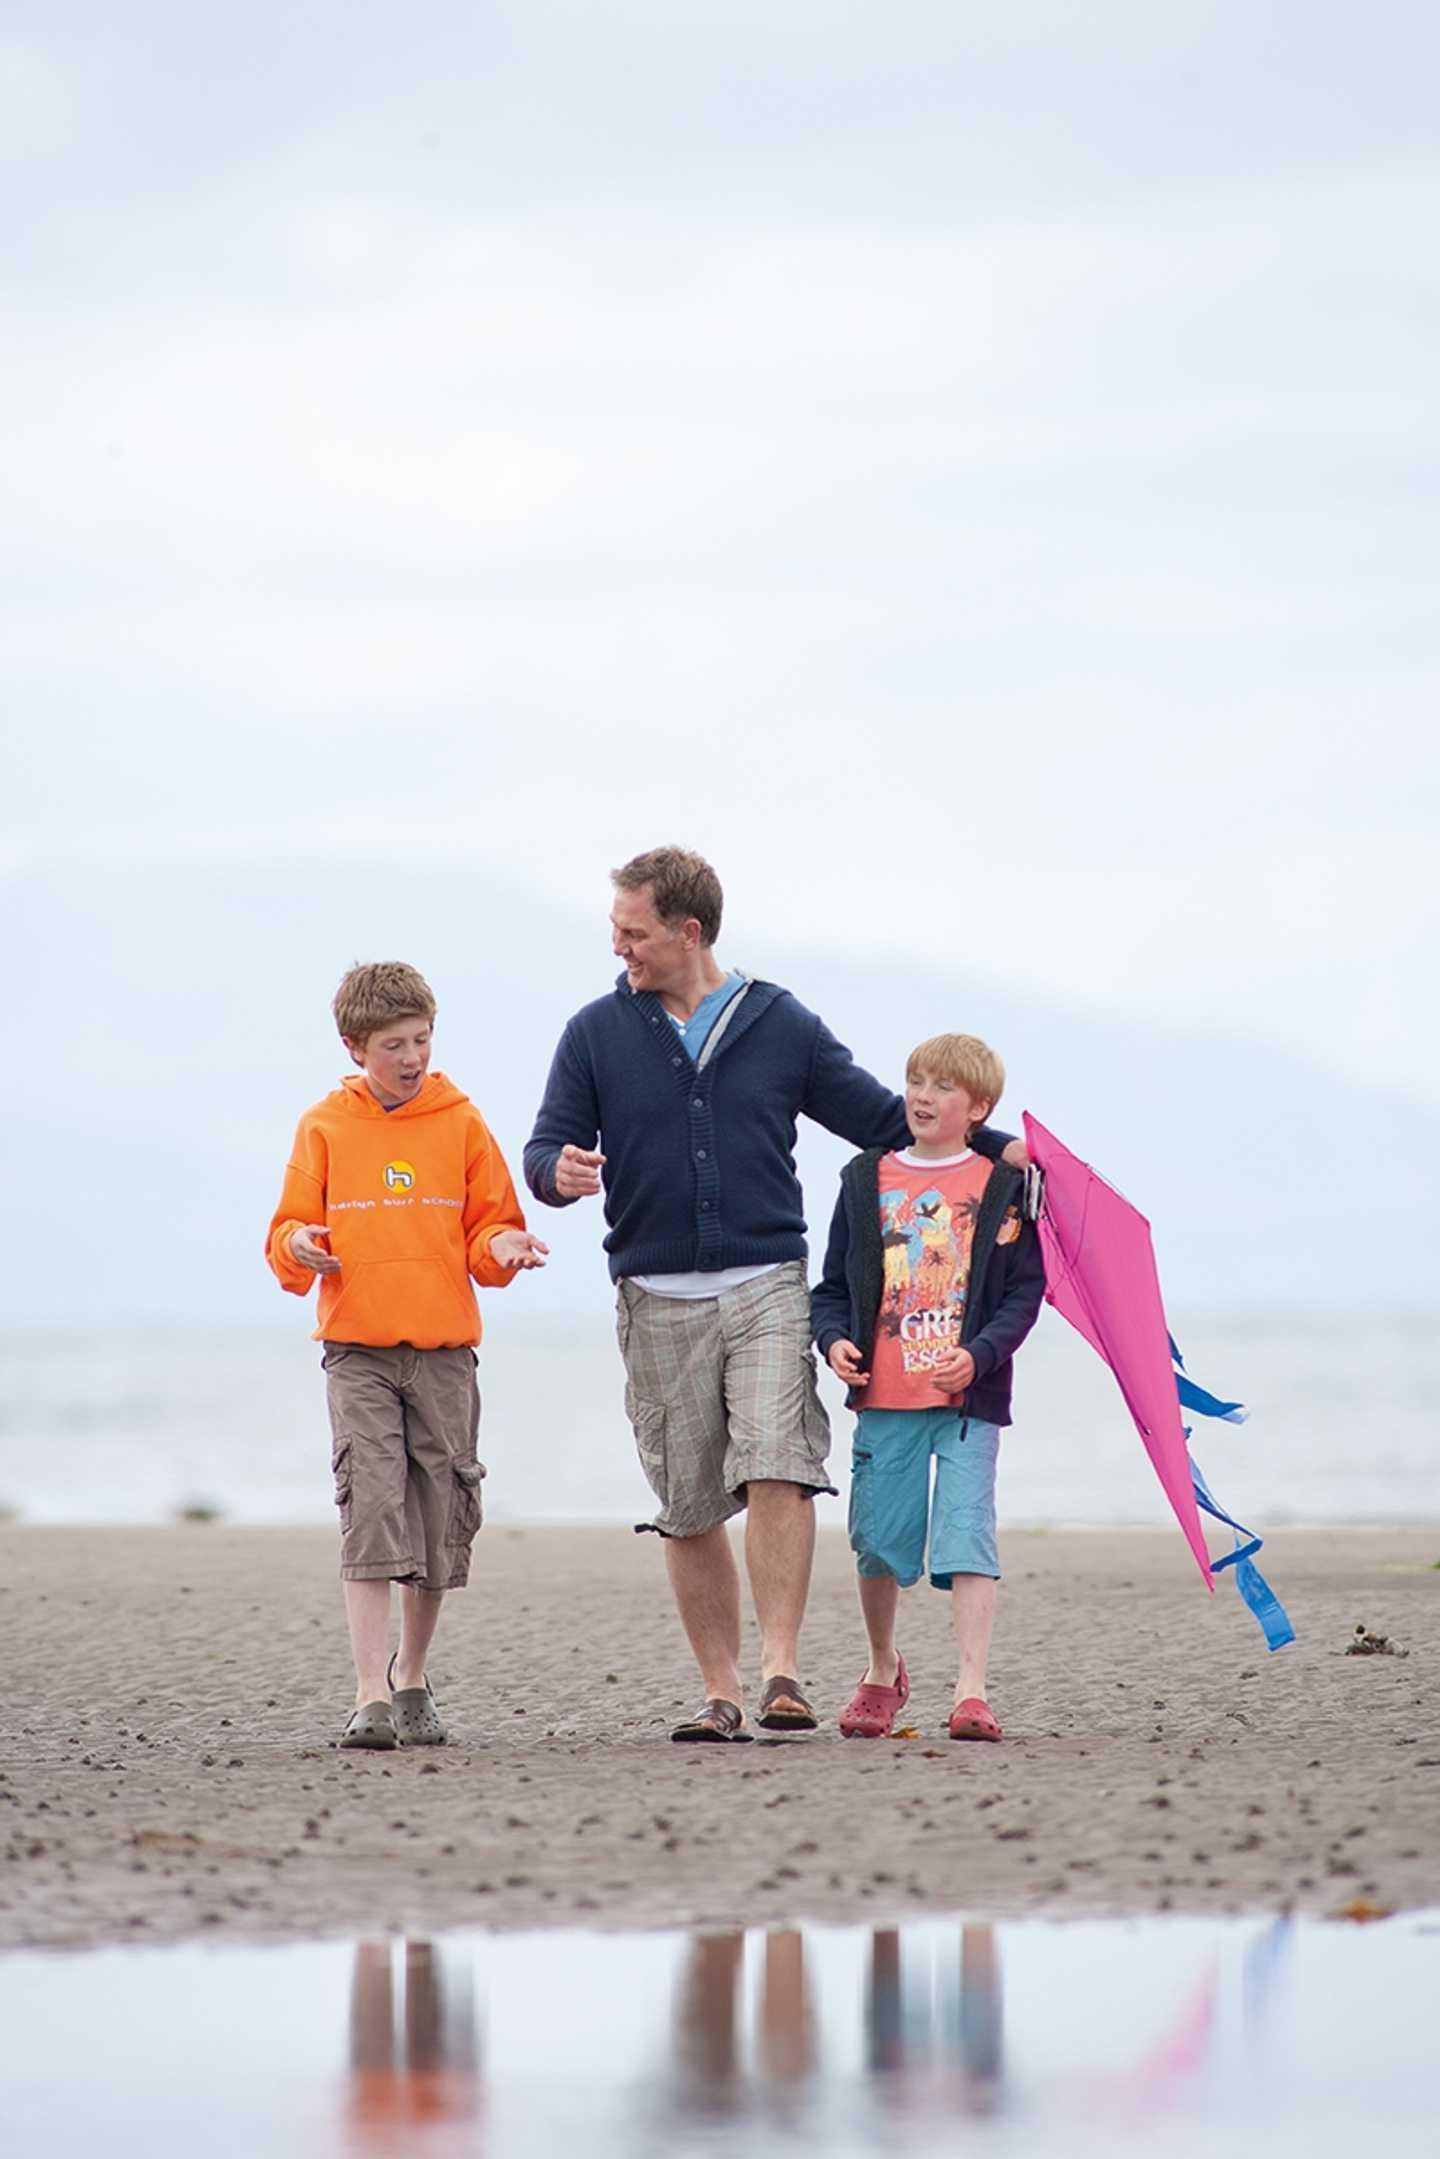 Parent and children flying kites on a beach by Craig Tara, Scotland